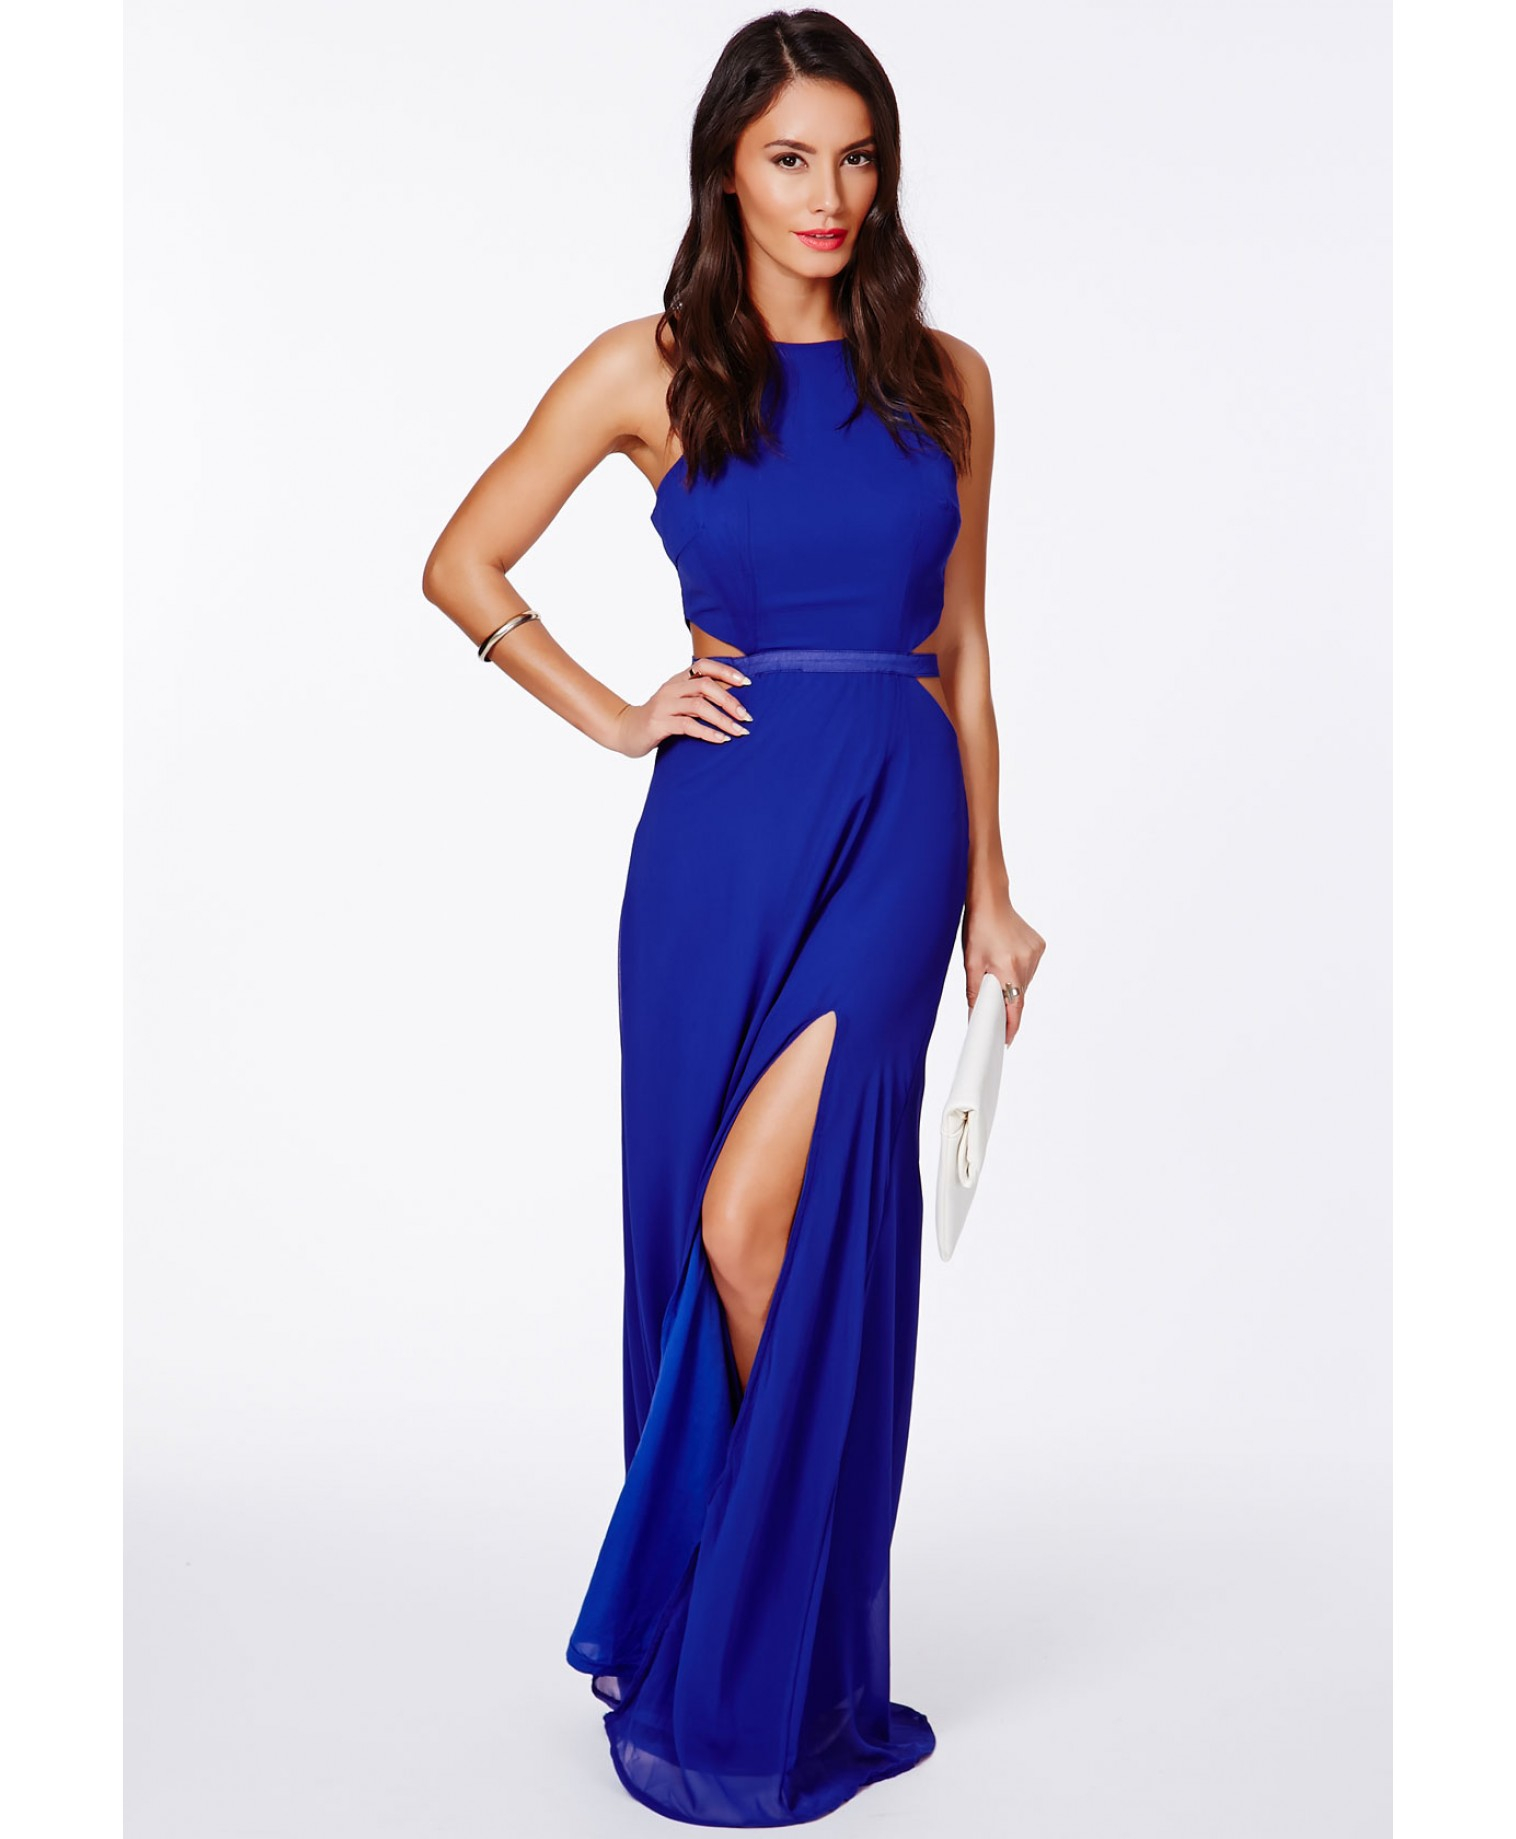 Lyst - Missguided Anthea Cut Out Split Maxi Dress In Cobalt Blue in Blue